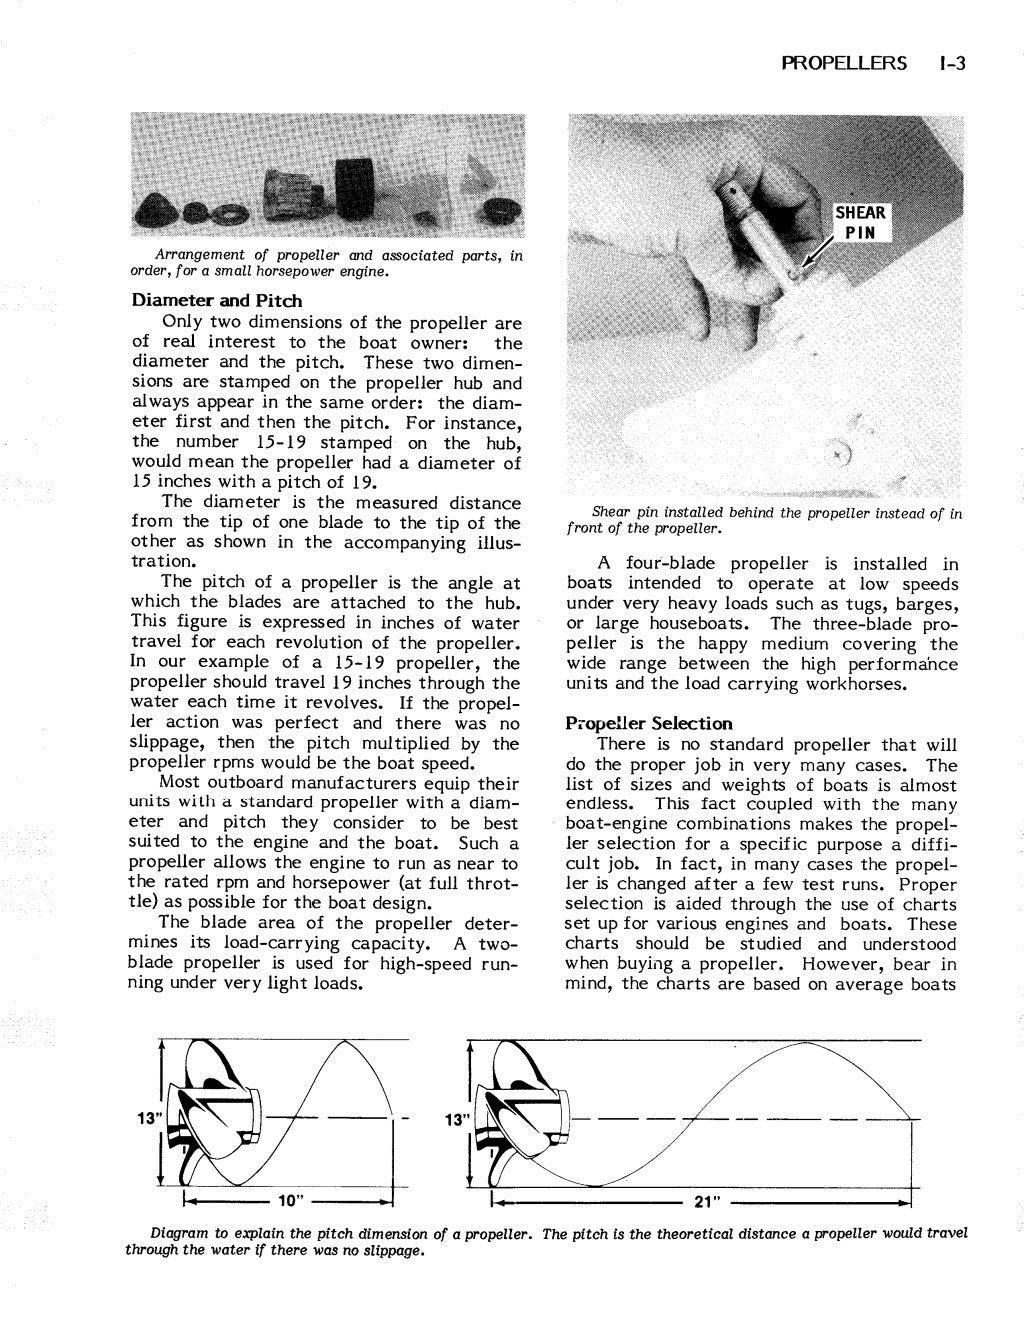 1974 Johnson Evinrude Outboard 4 Hp Service Repair Manual